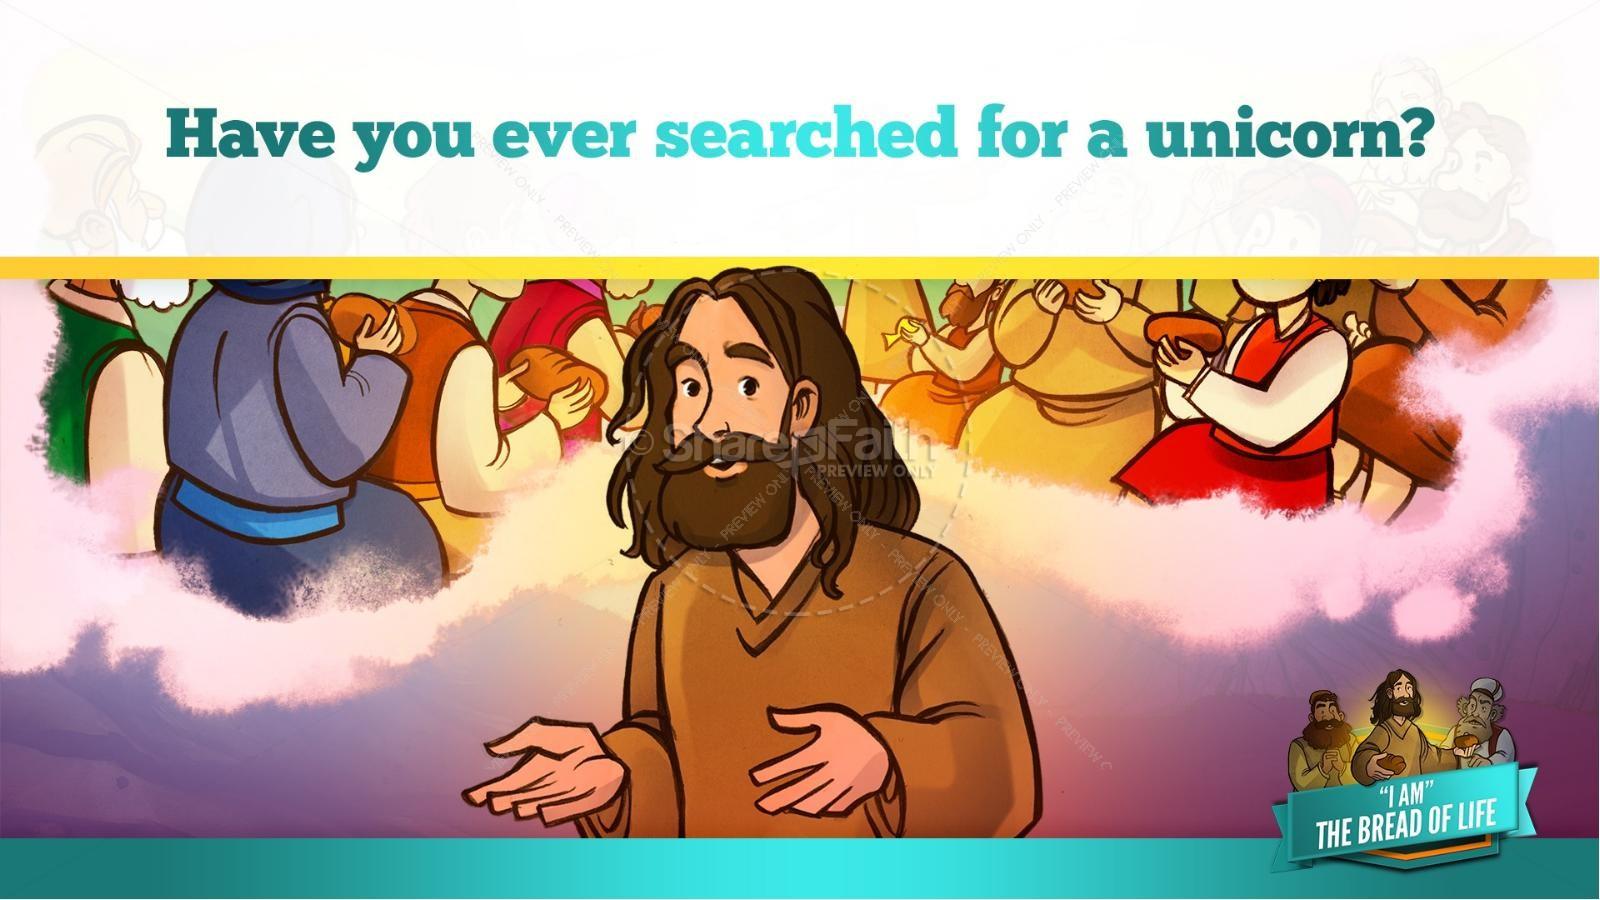 John 6 Bread of Life Kids Bible Stories | slide 21